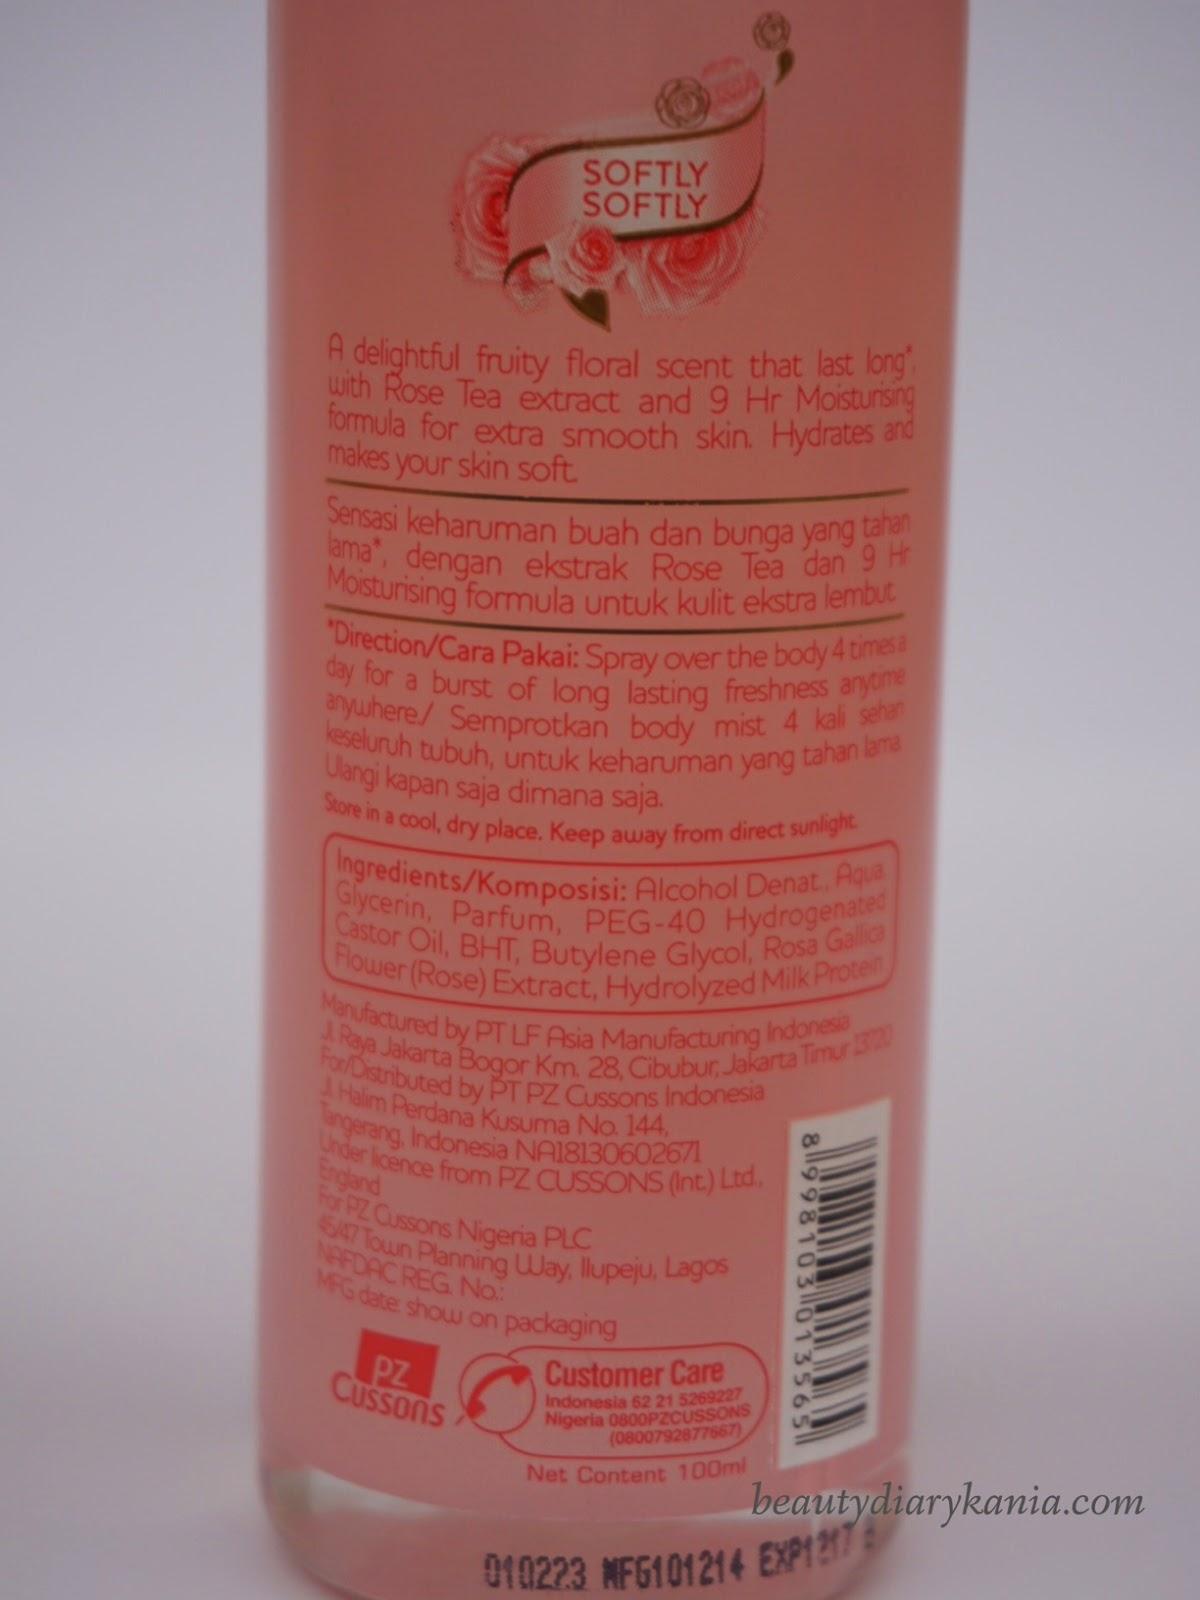 Beauty Diary Kania April 2015 Cussons Imperial Leather Body Wash White Princess Kemasan Mist Softly Dikemas Menggunakan Botol Plastik Bening Yang Diberikan Label Bewarna Soft Pink Dengan Sisinya